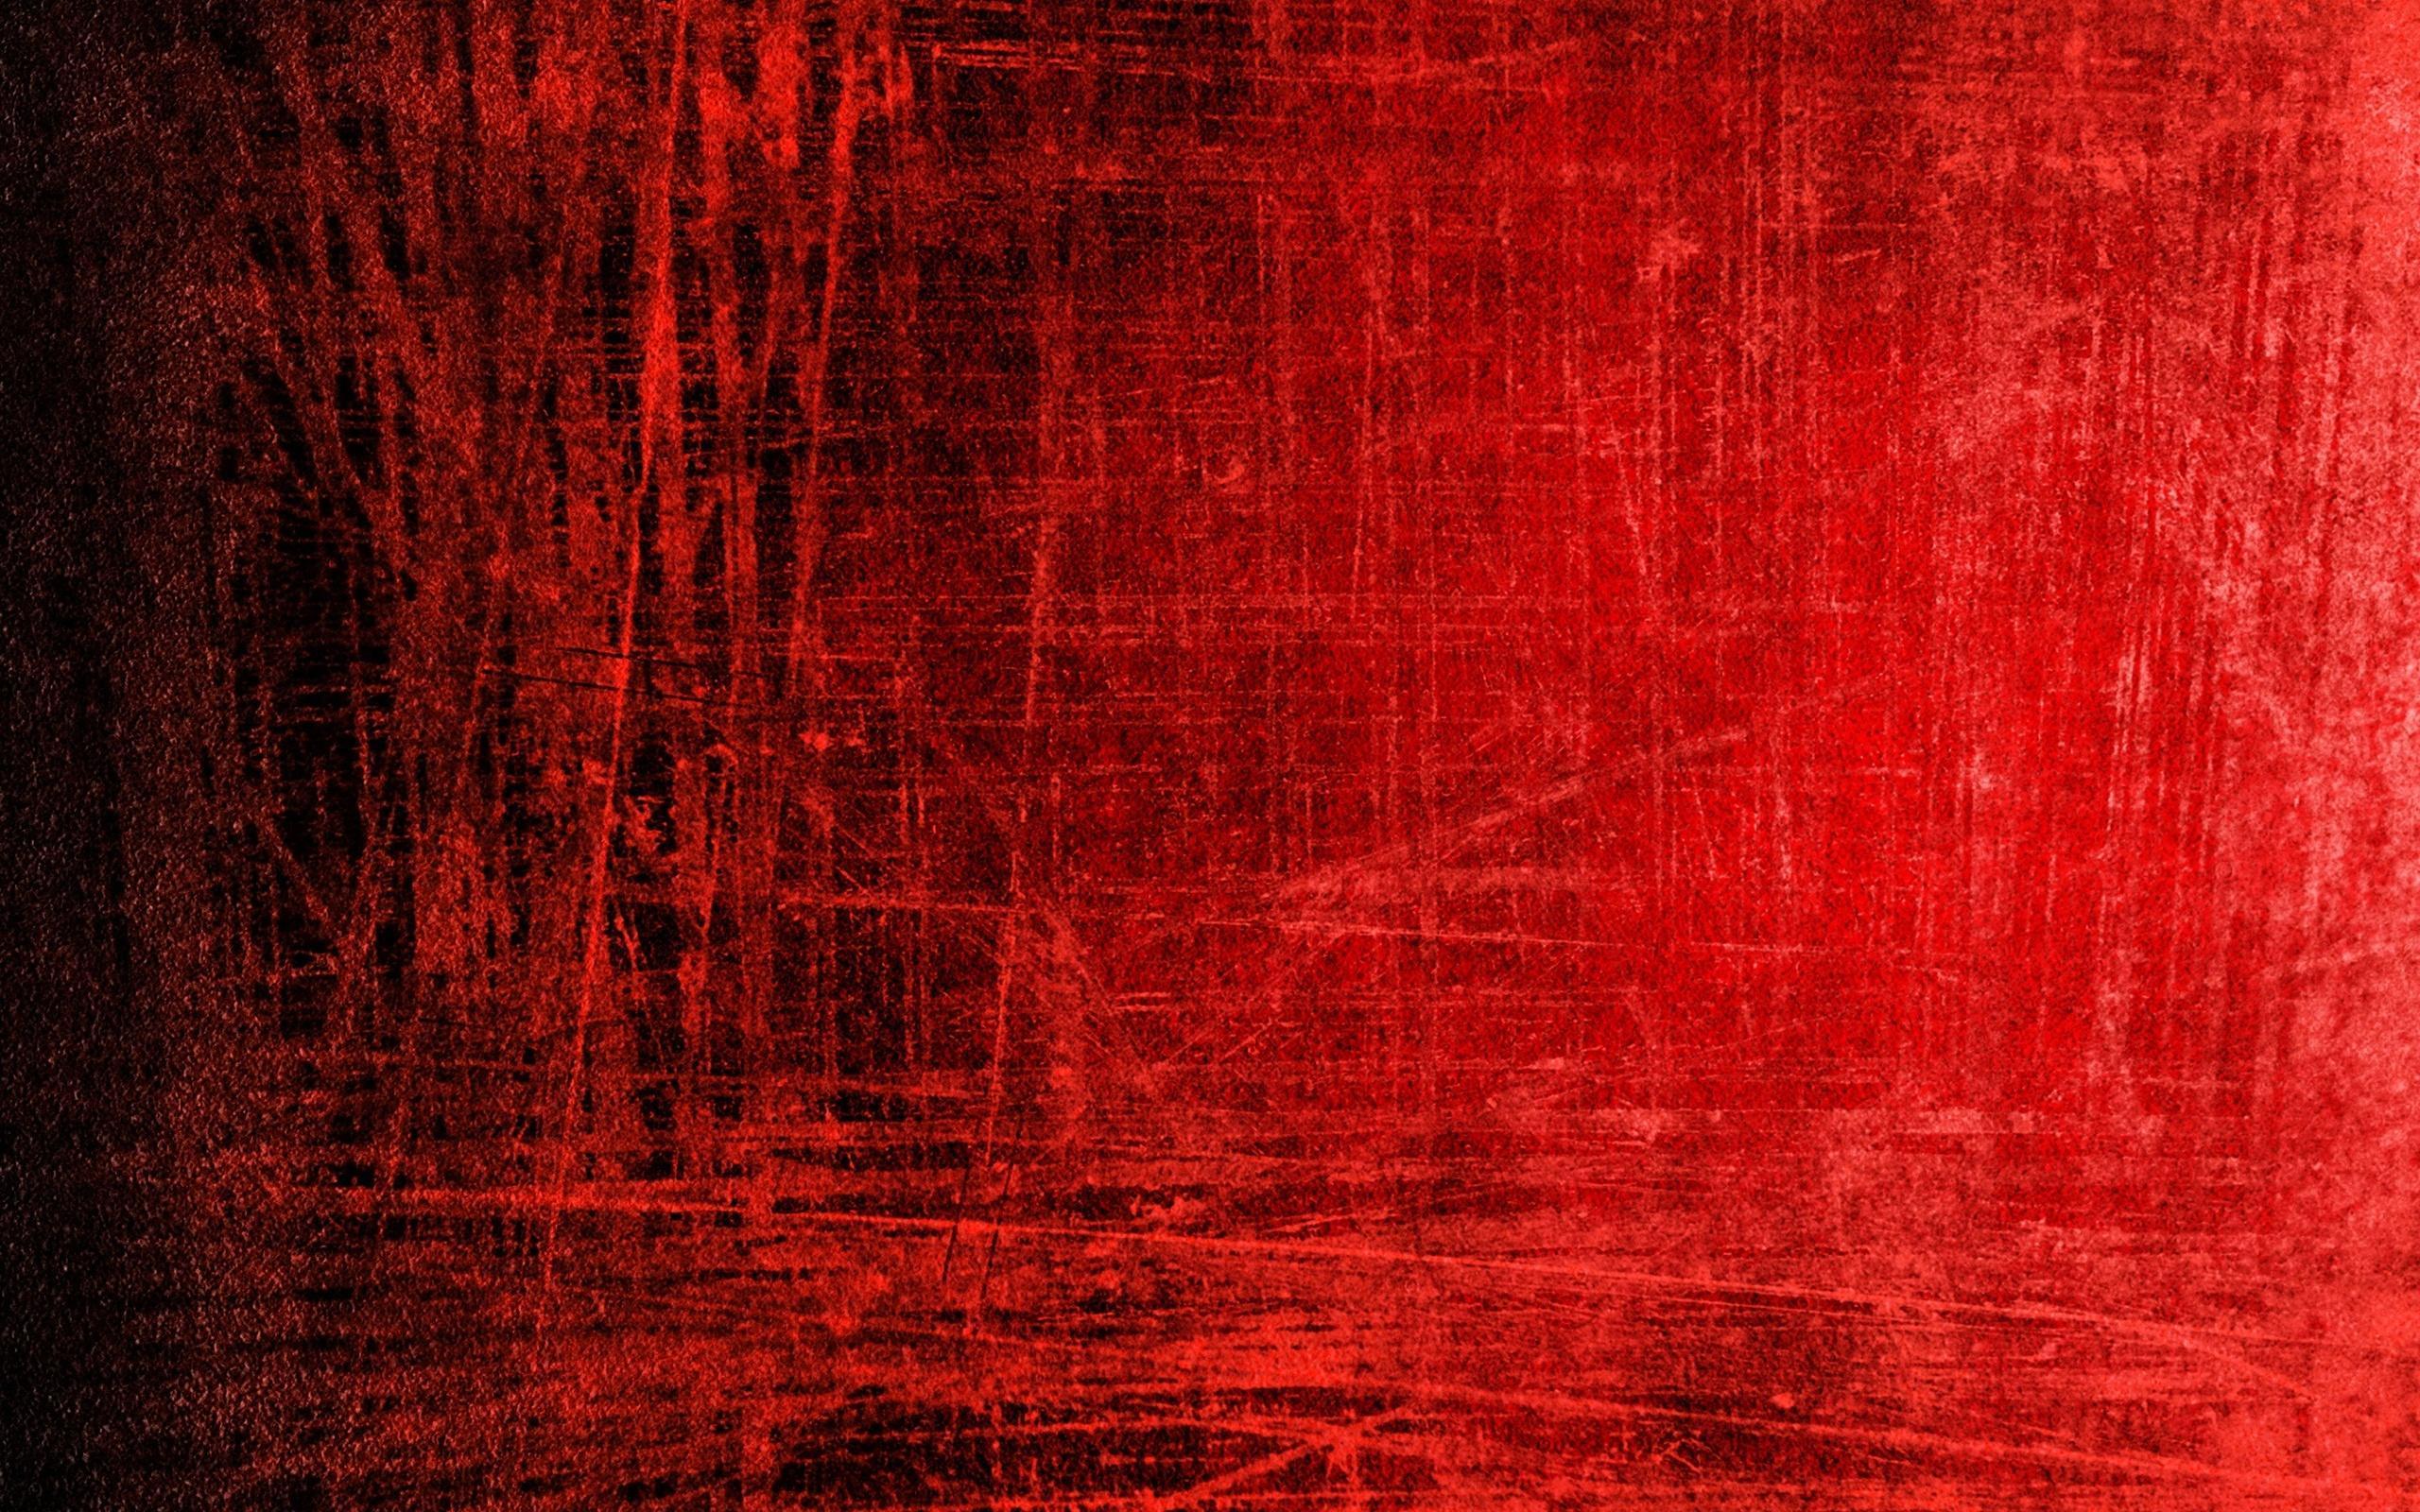 Красный экран картинка